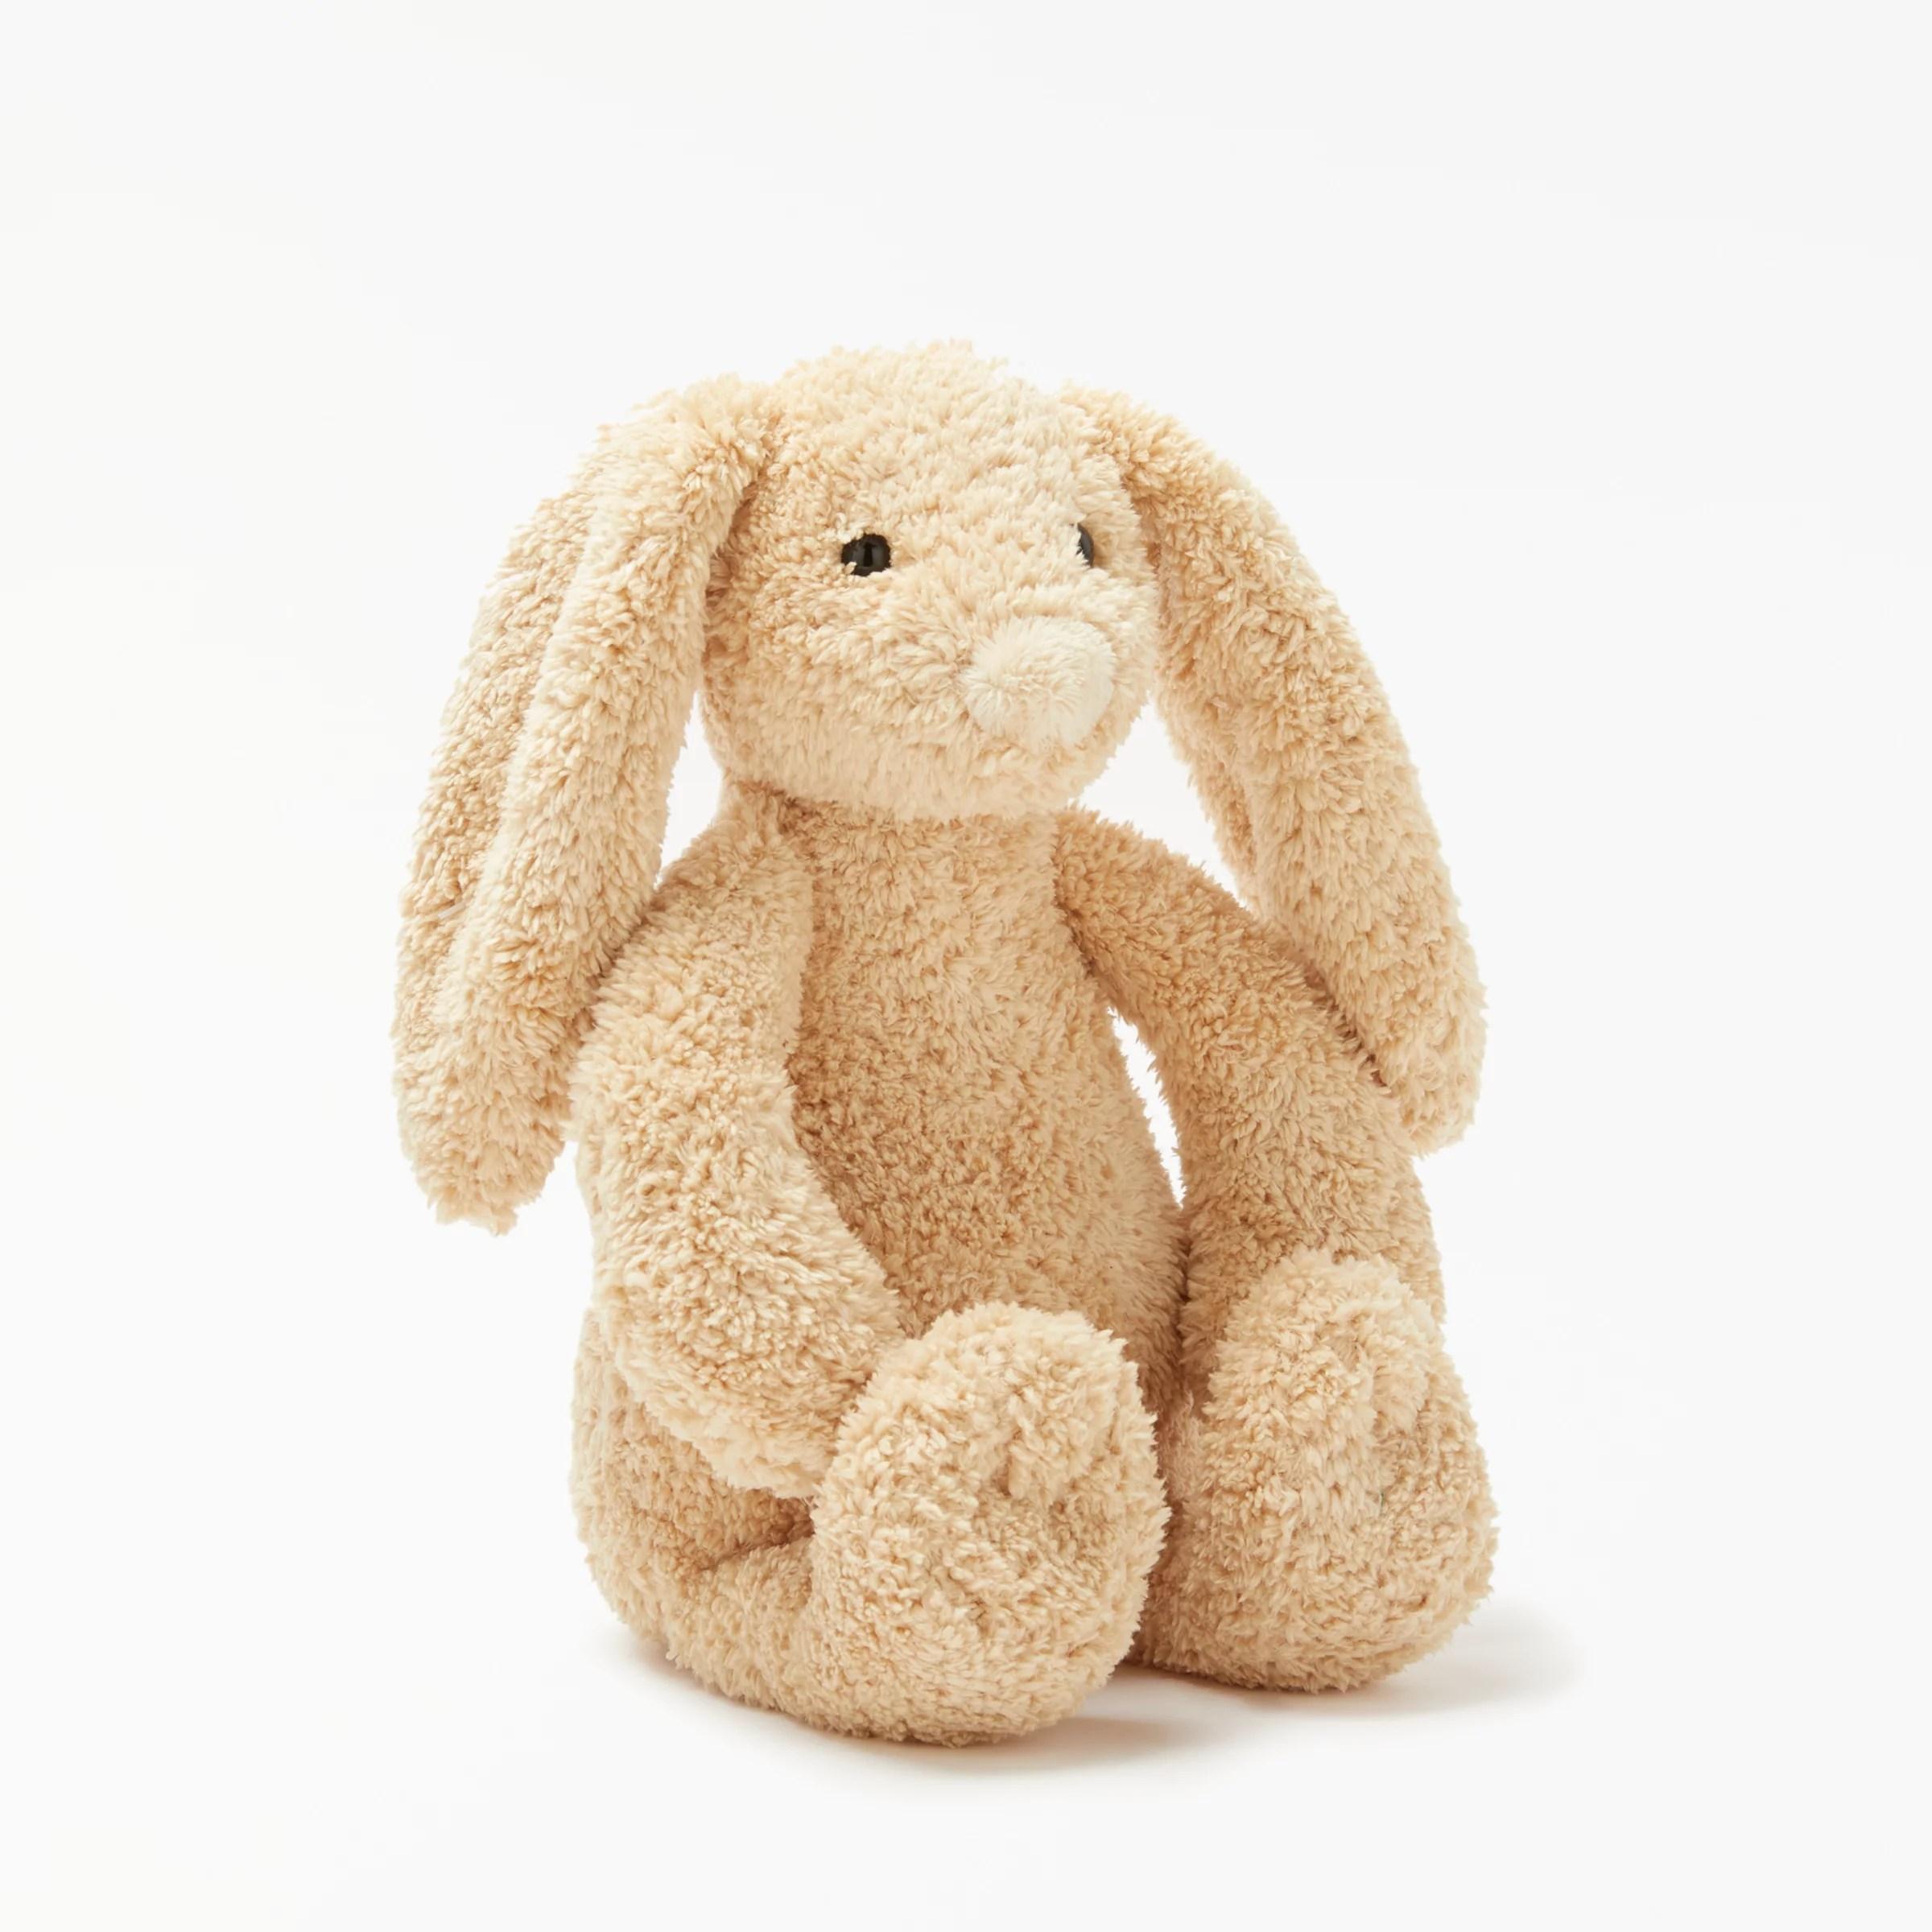 John Lewis Amp Partners Rusty The Rabbit Soft Toy At John Lewis Amp Partners